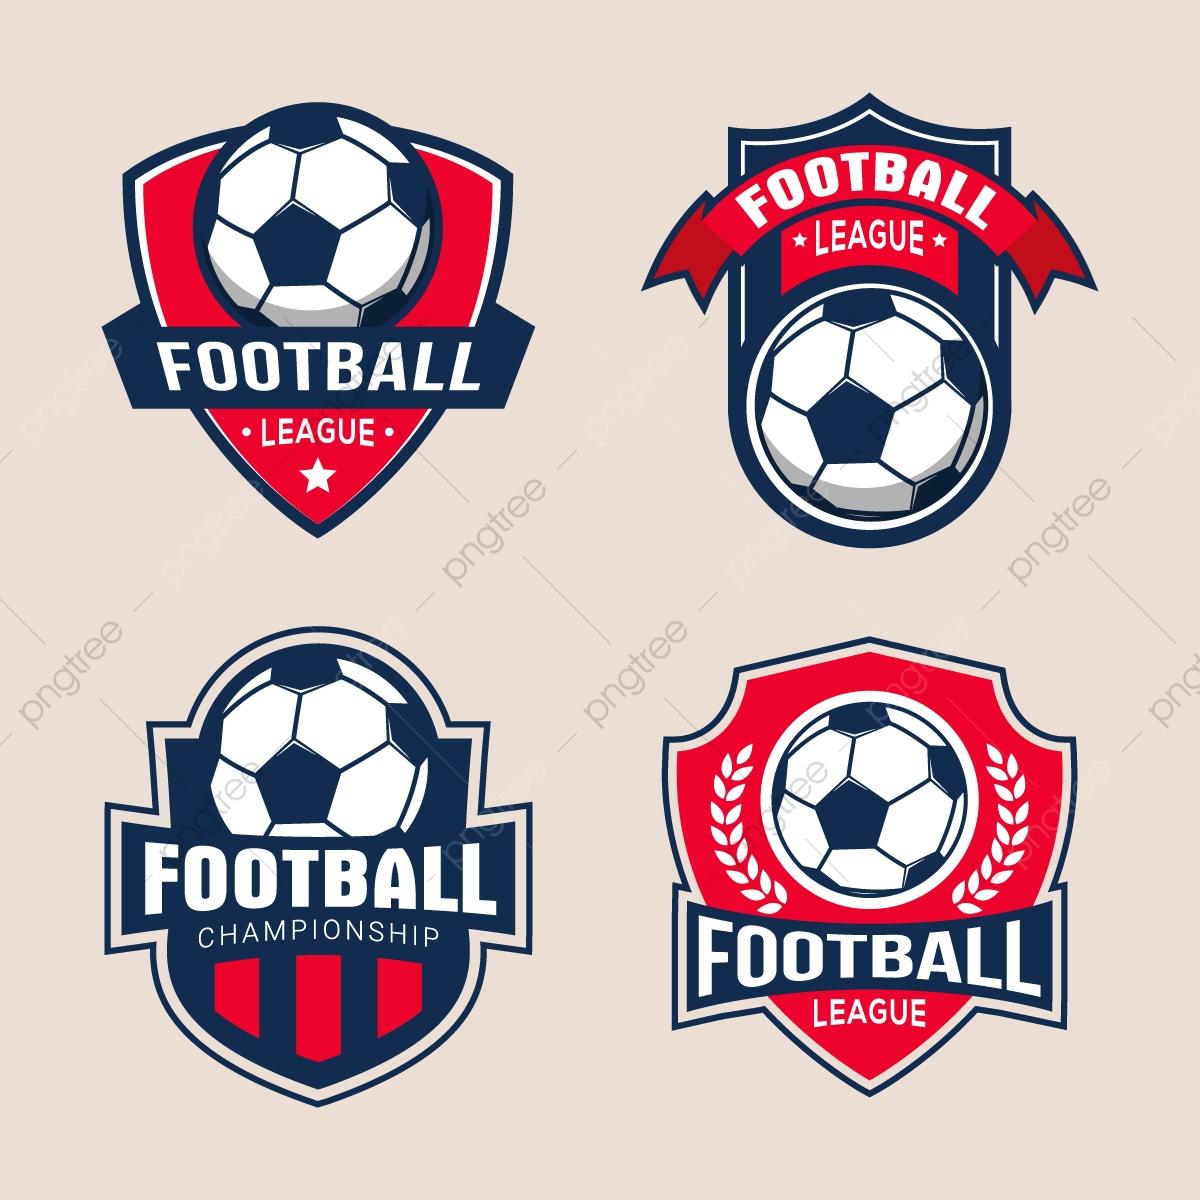 vector free download Logo design templates football. Vector emblem soccer